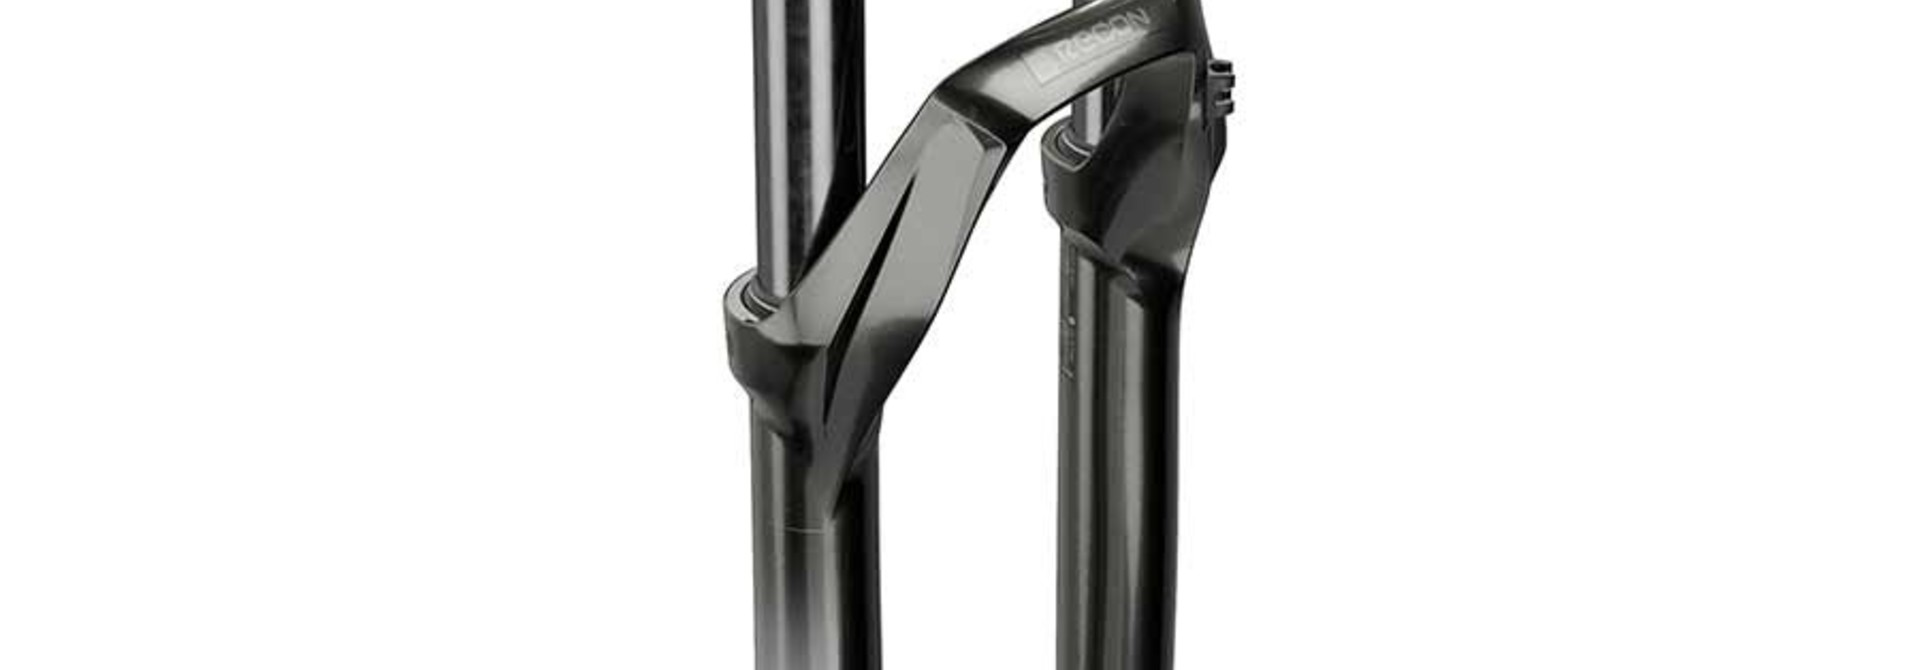 RockShox, Recon Silver RL D1, Suspension Fork, 29'', Air, 100mm, 1-1/8''-1.5'', 15x100mm TA, Rake: 51mm, Black